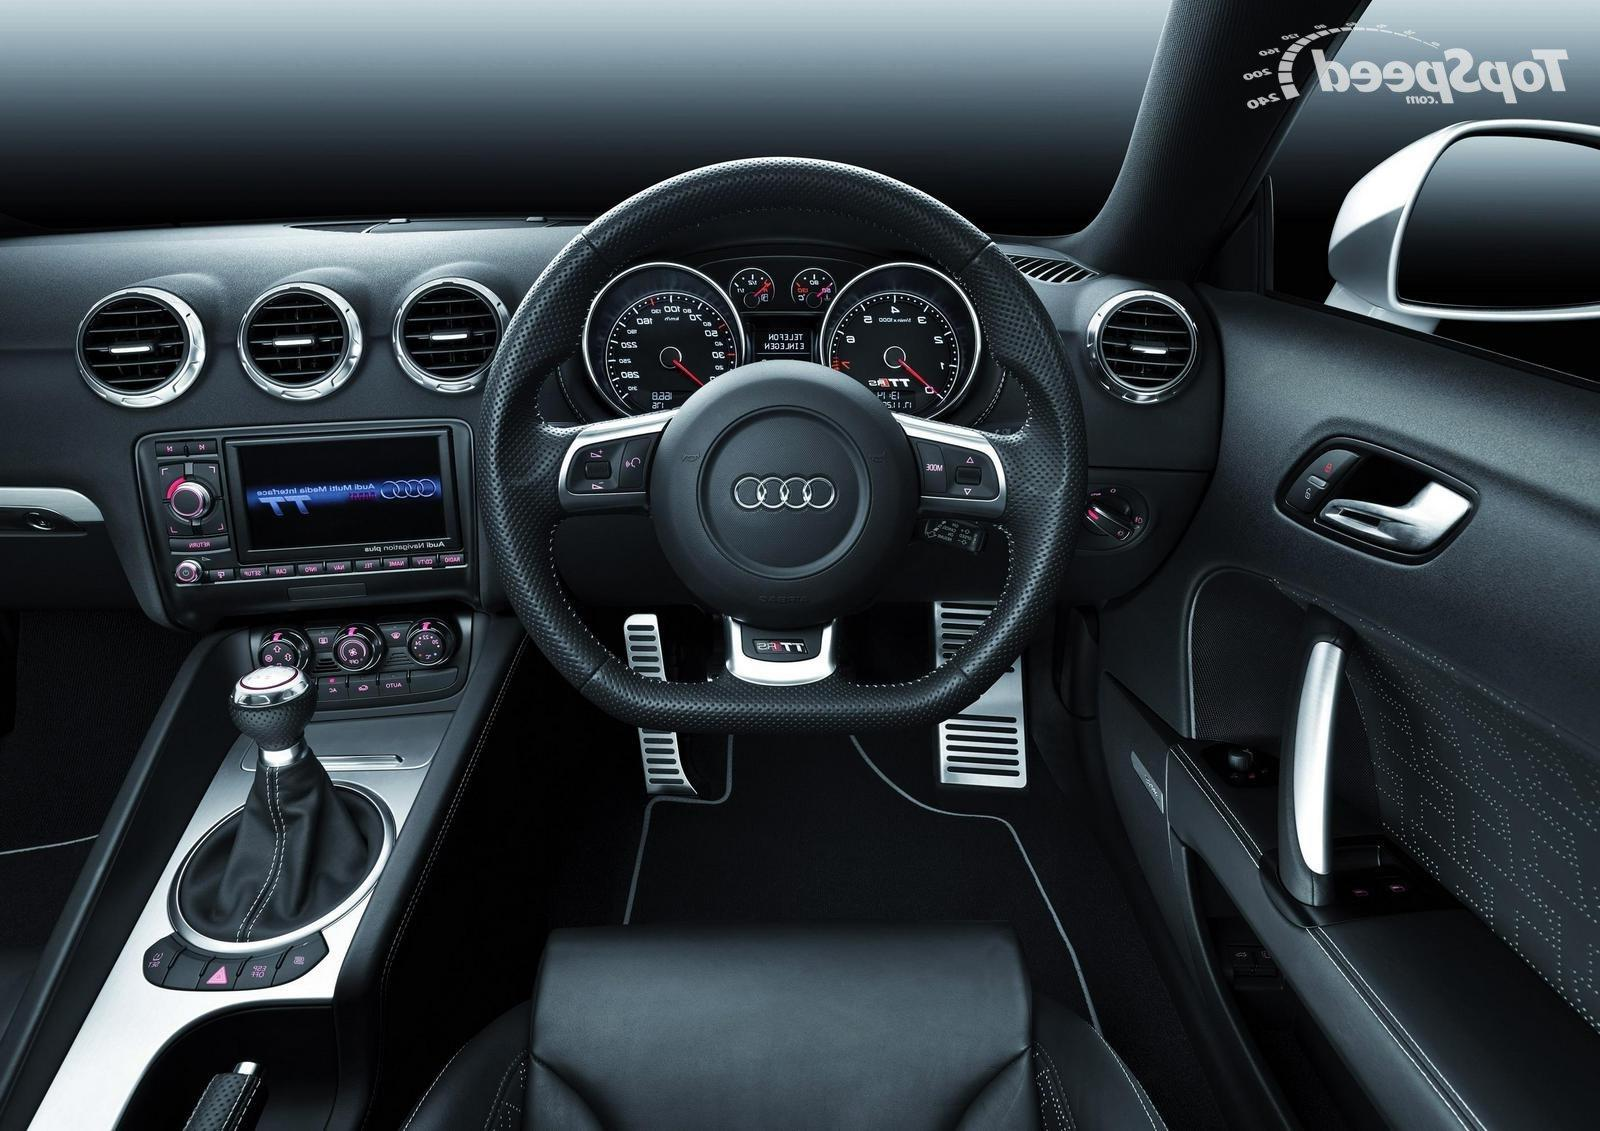 Audi Tt White 2010